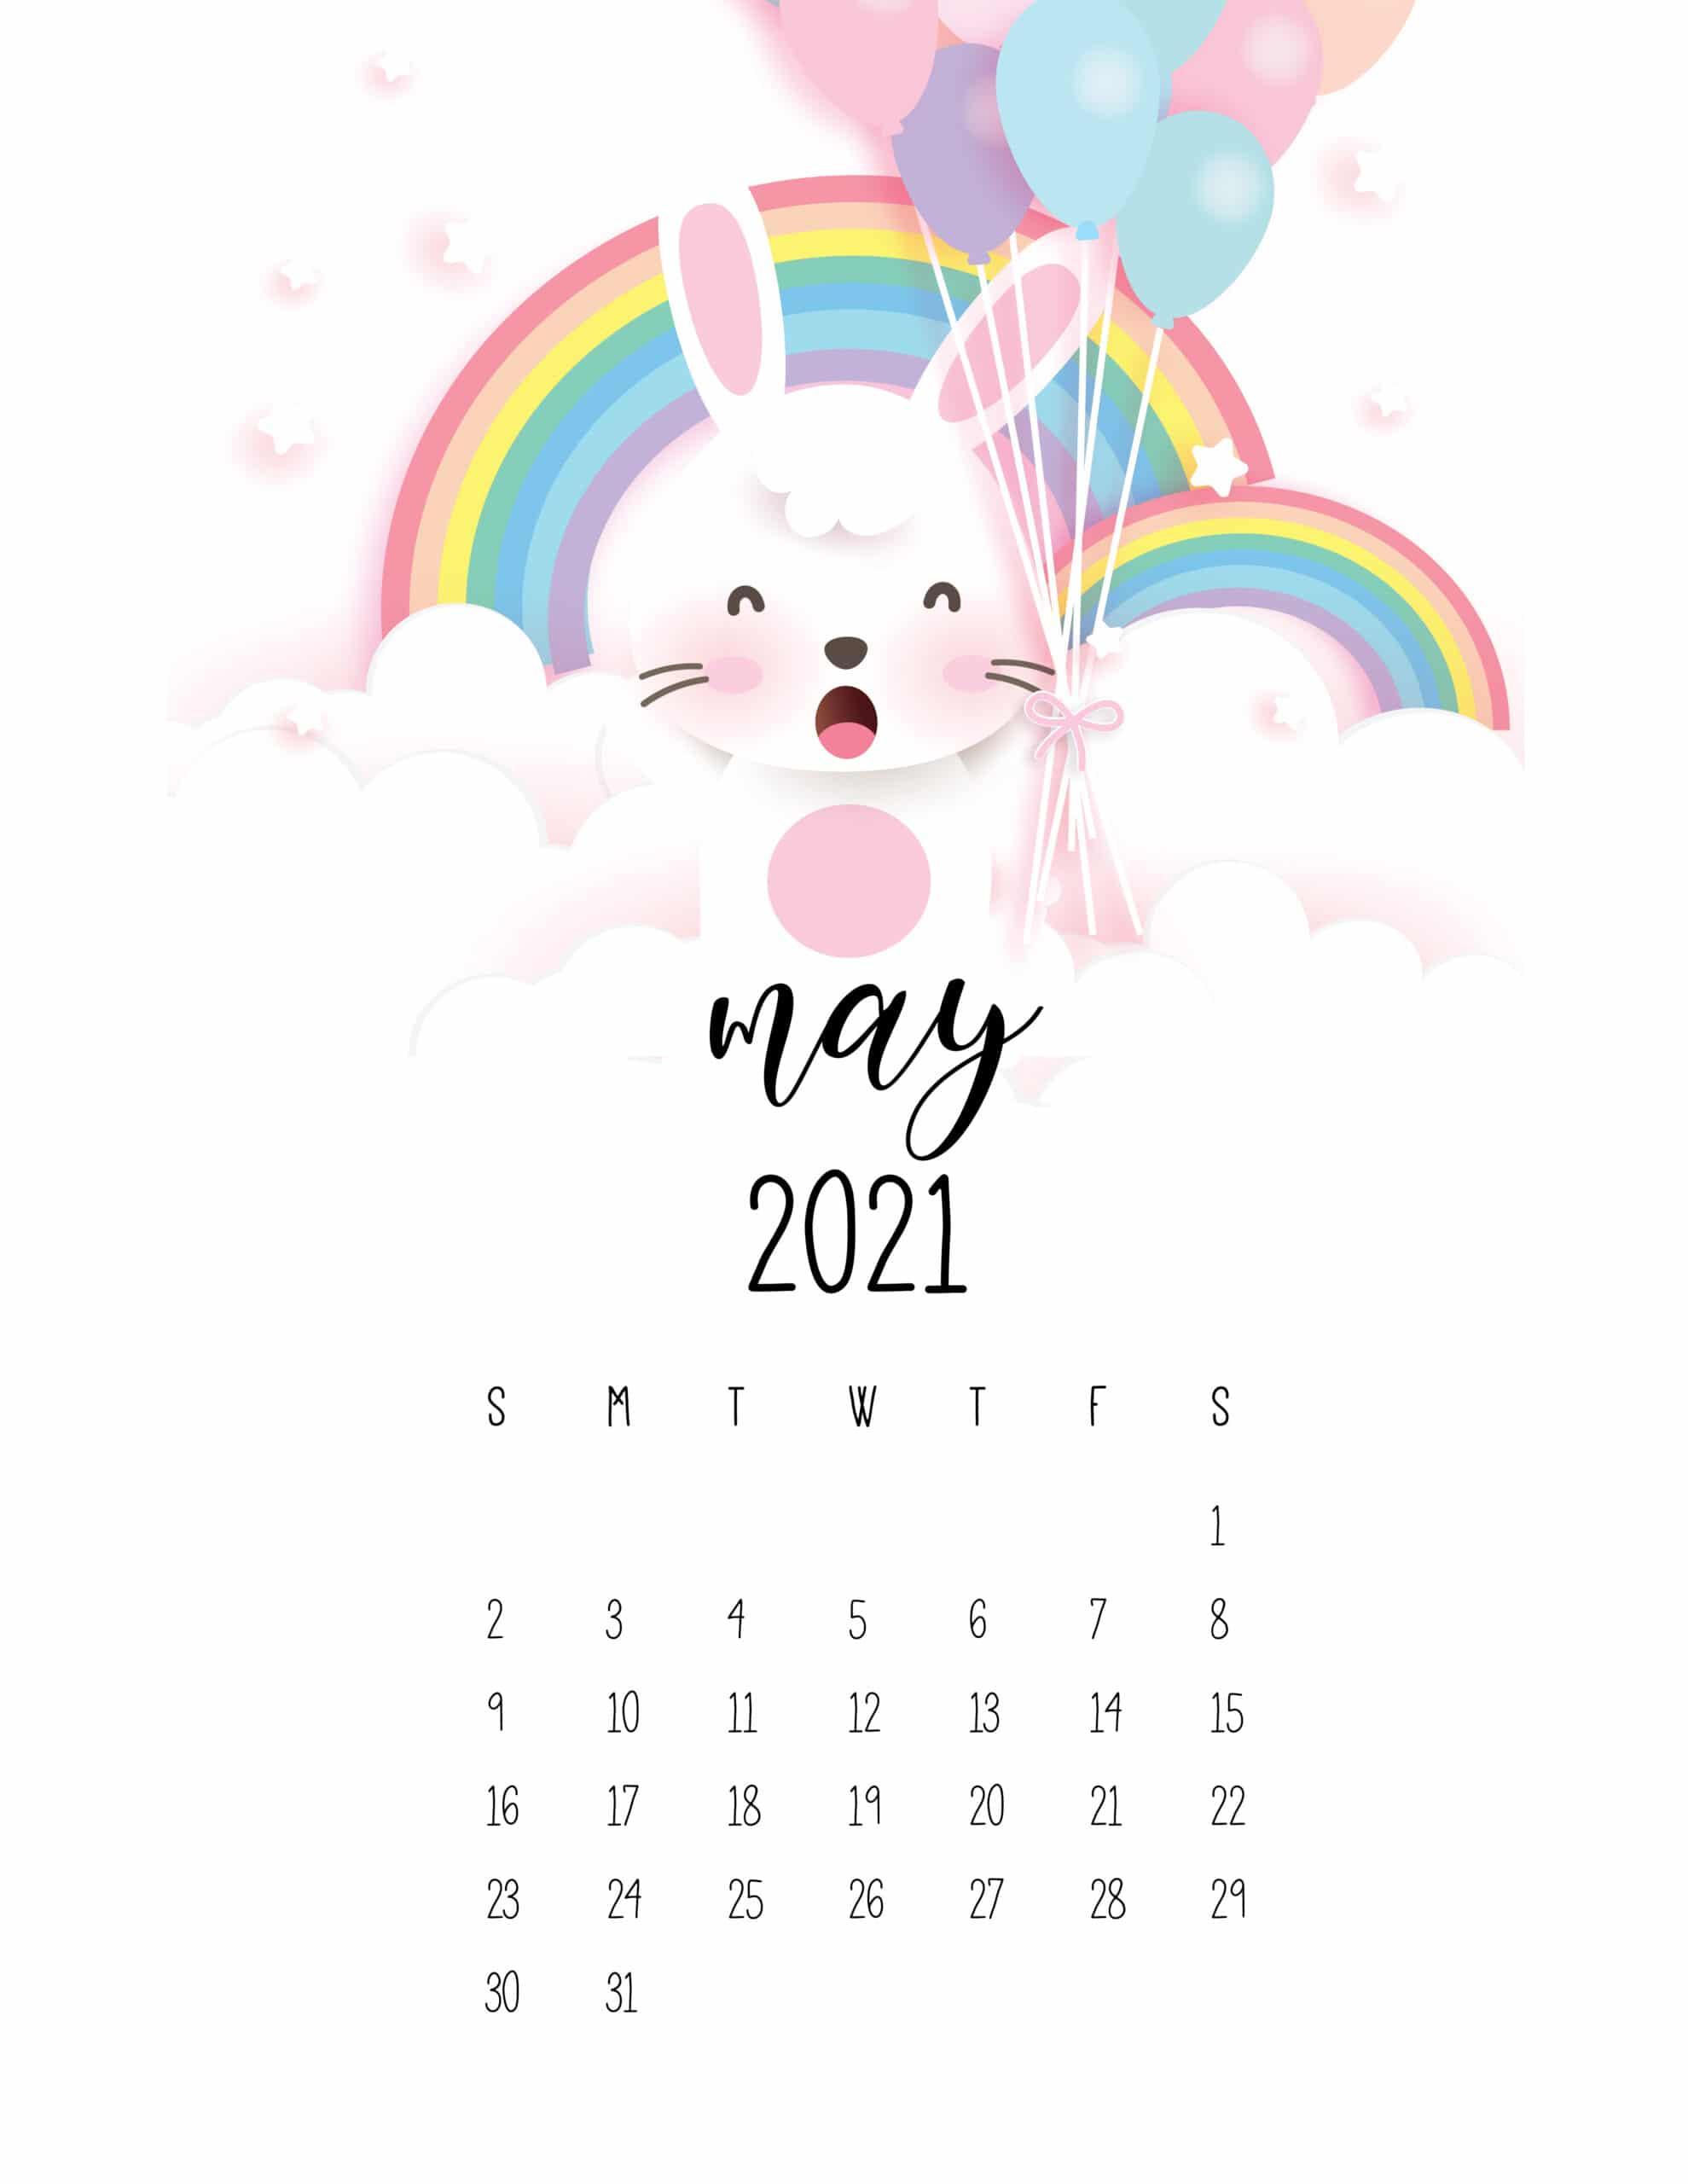 Cute Rabbits And Rainbows 2021 Calendar - World of Printables